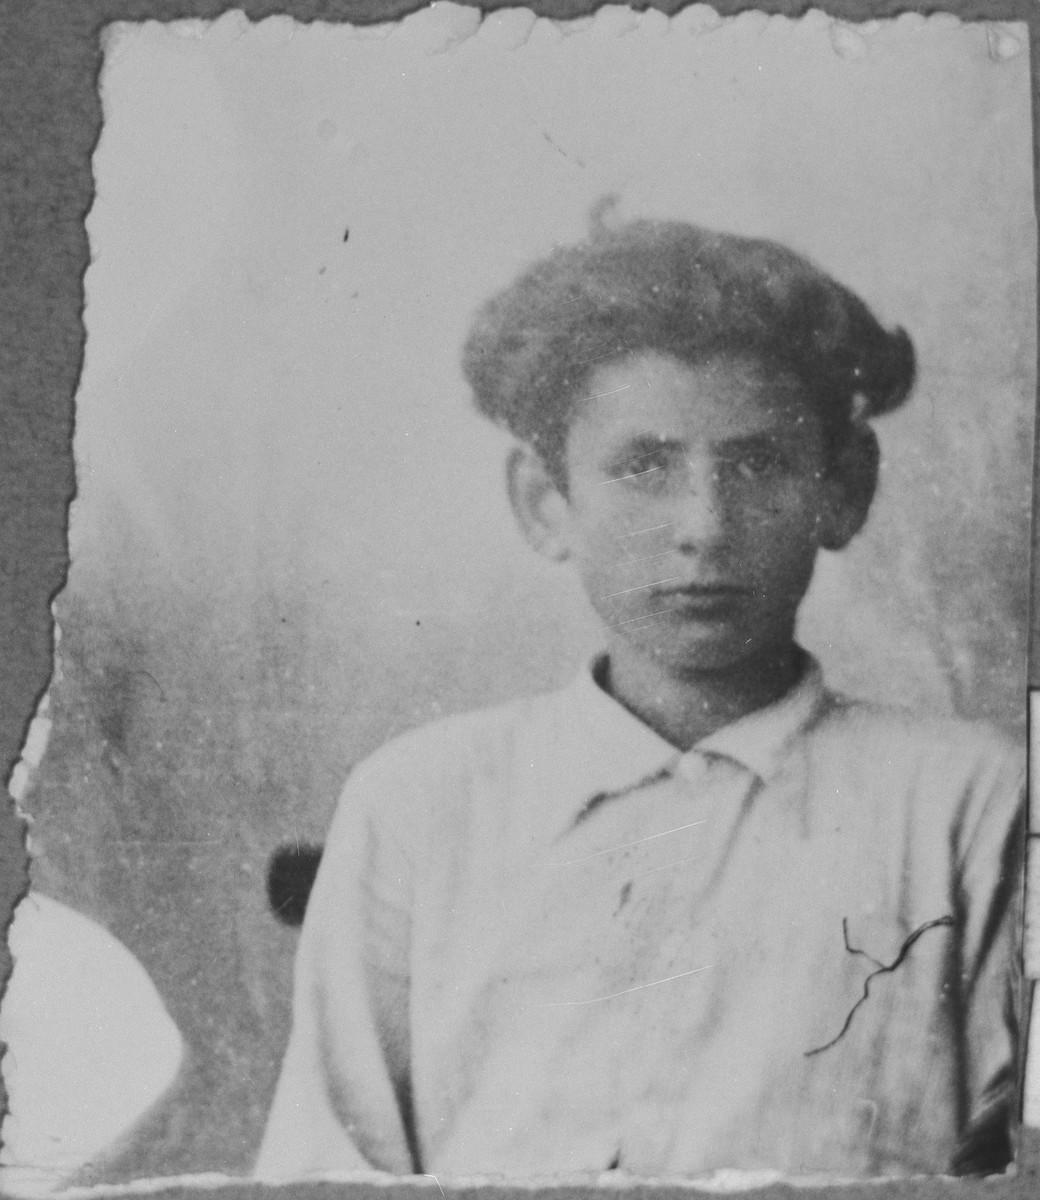 Portrait of Lazar Pardo, son of Bohor Pardo.  He lived at Novatska 8 in Bitola.